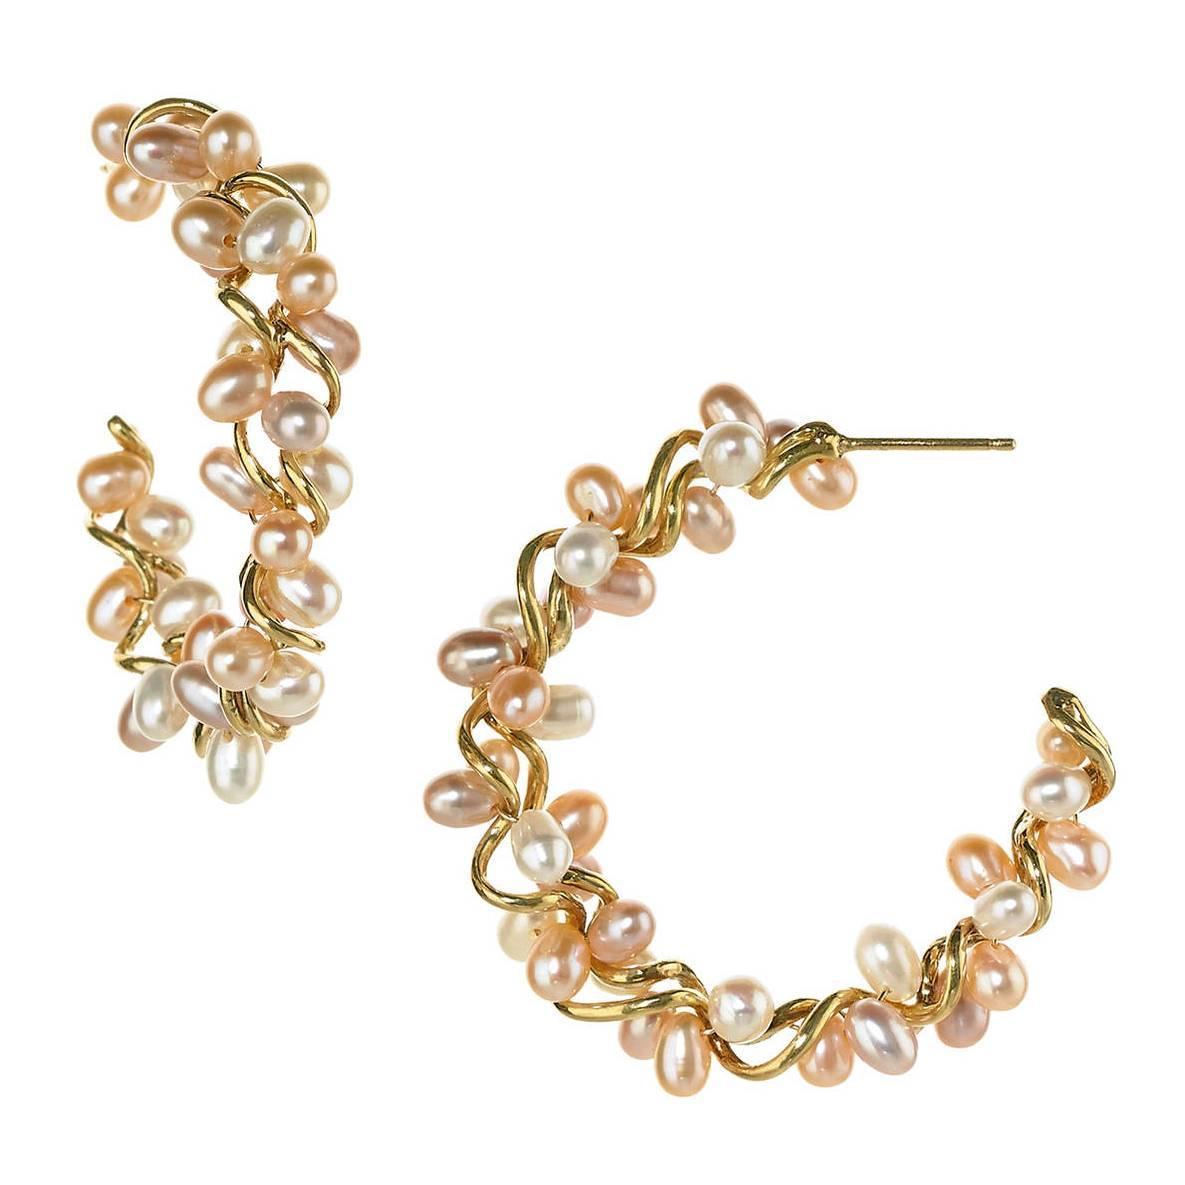 Explore 1stdibs Furniture Fine Art Jewelry & Watches Fashion Interiors ...